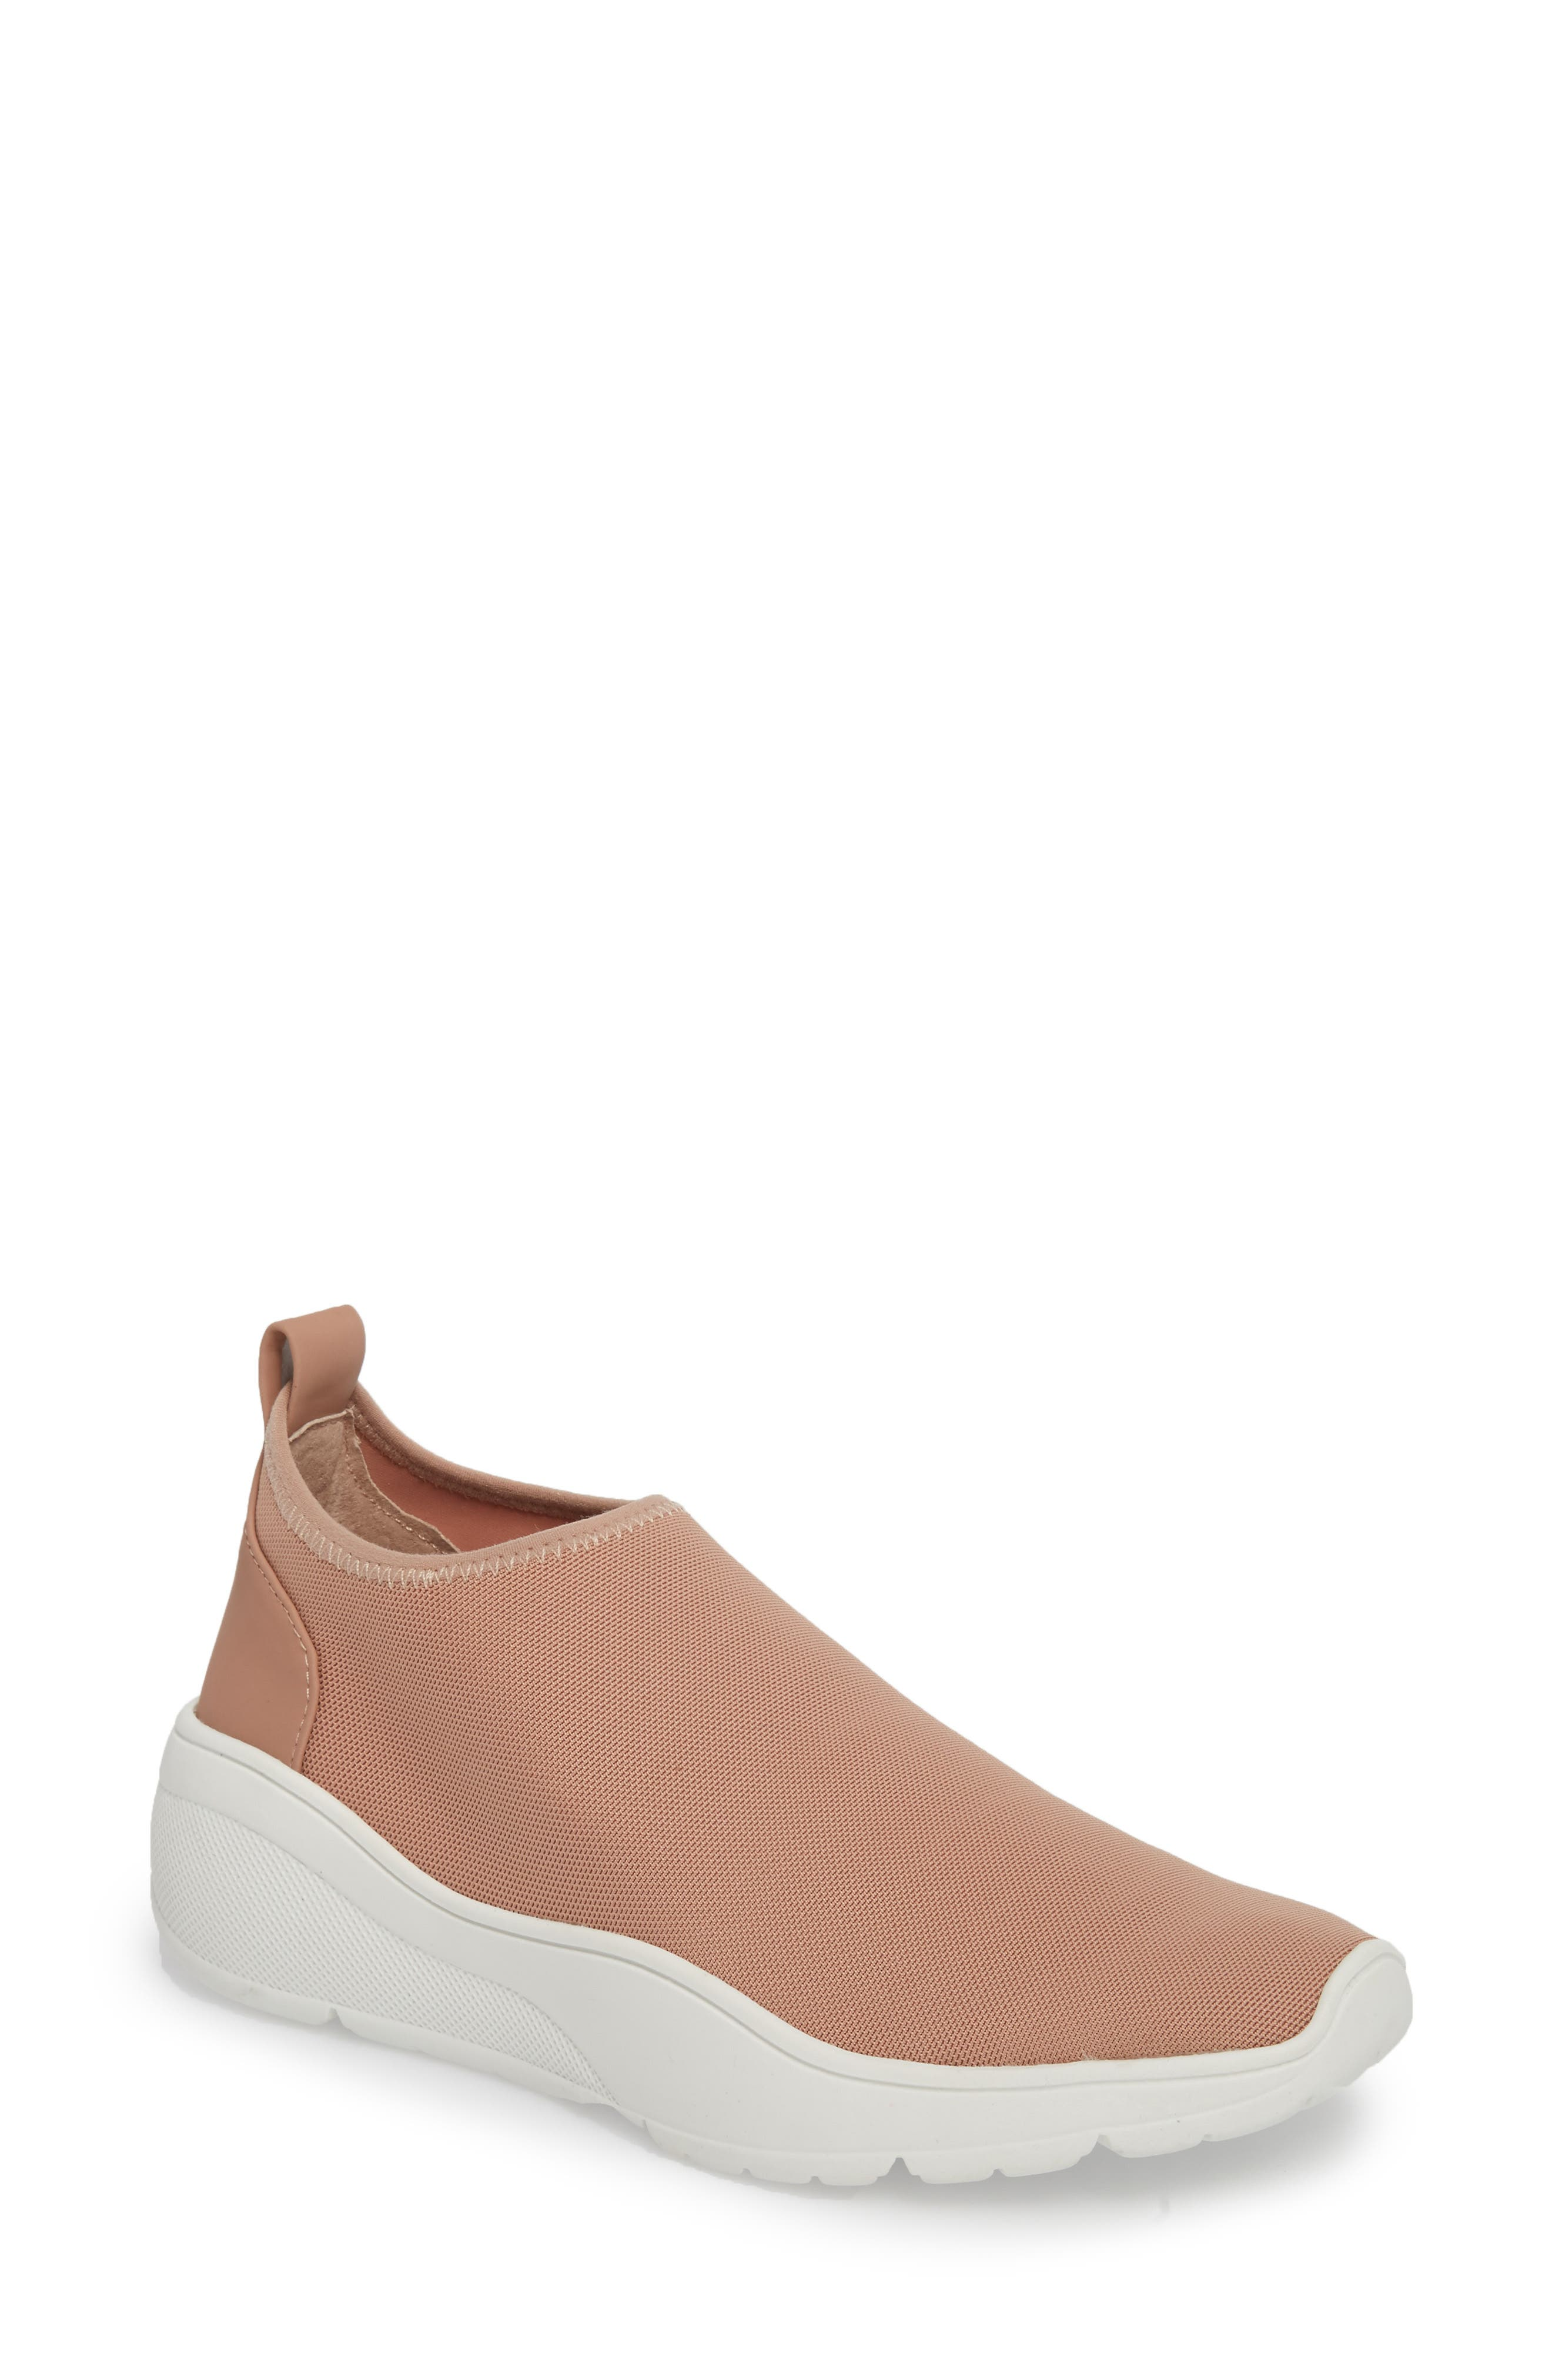 Floren Slip-On Sneaker,                             Main thumbnail 1, color,                             Blush